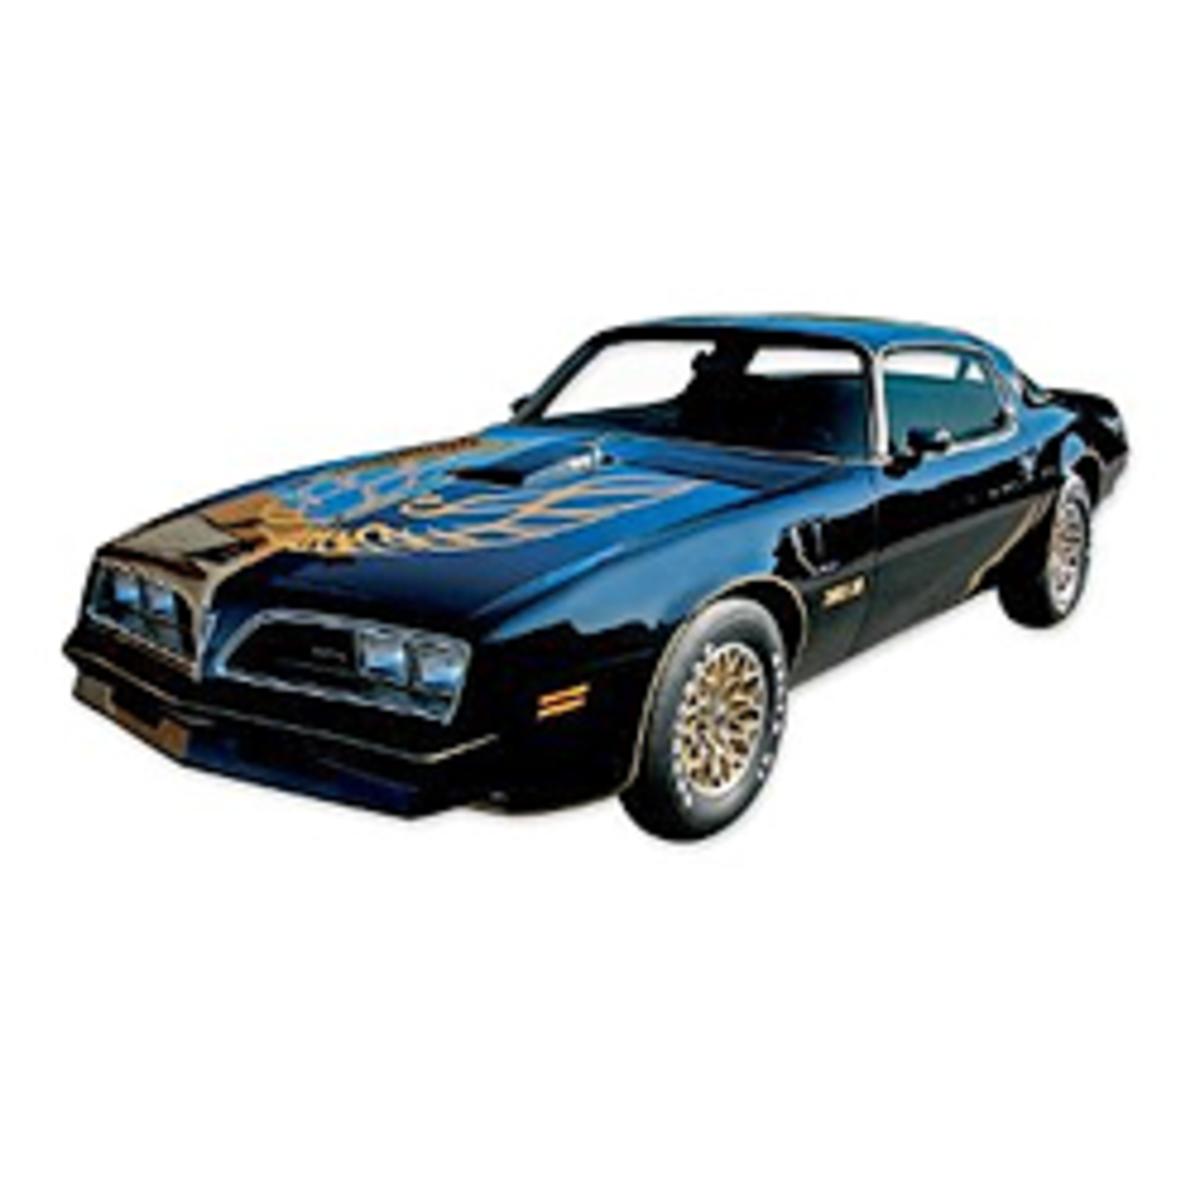 1976 1977 1978 Pontiac Firebird Trans Am Special Edition Bandit Decals